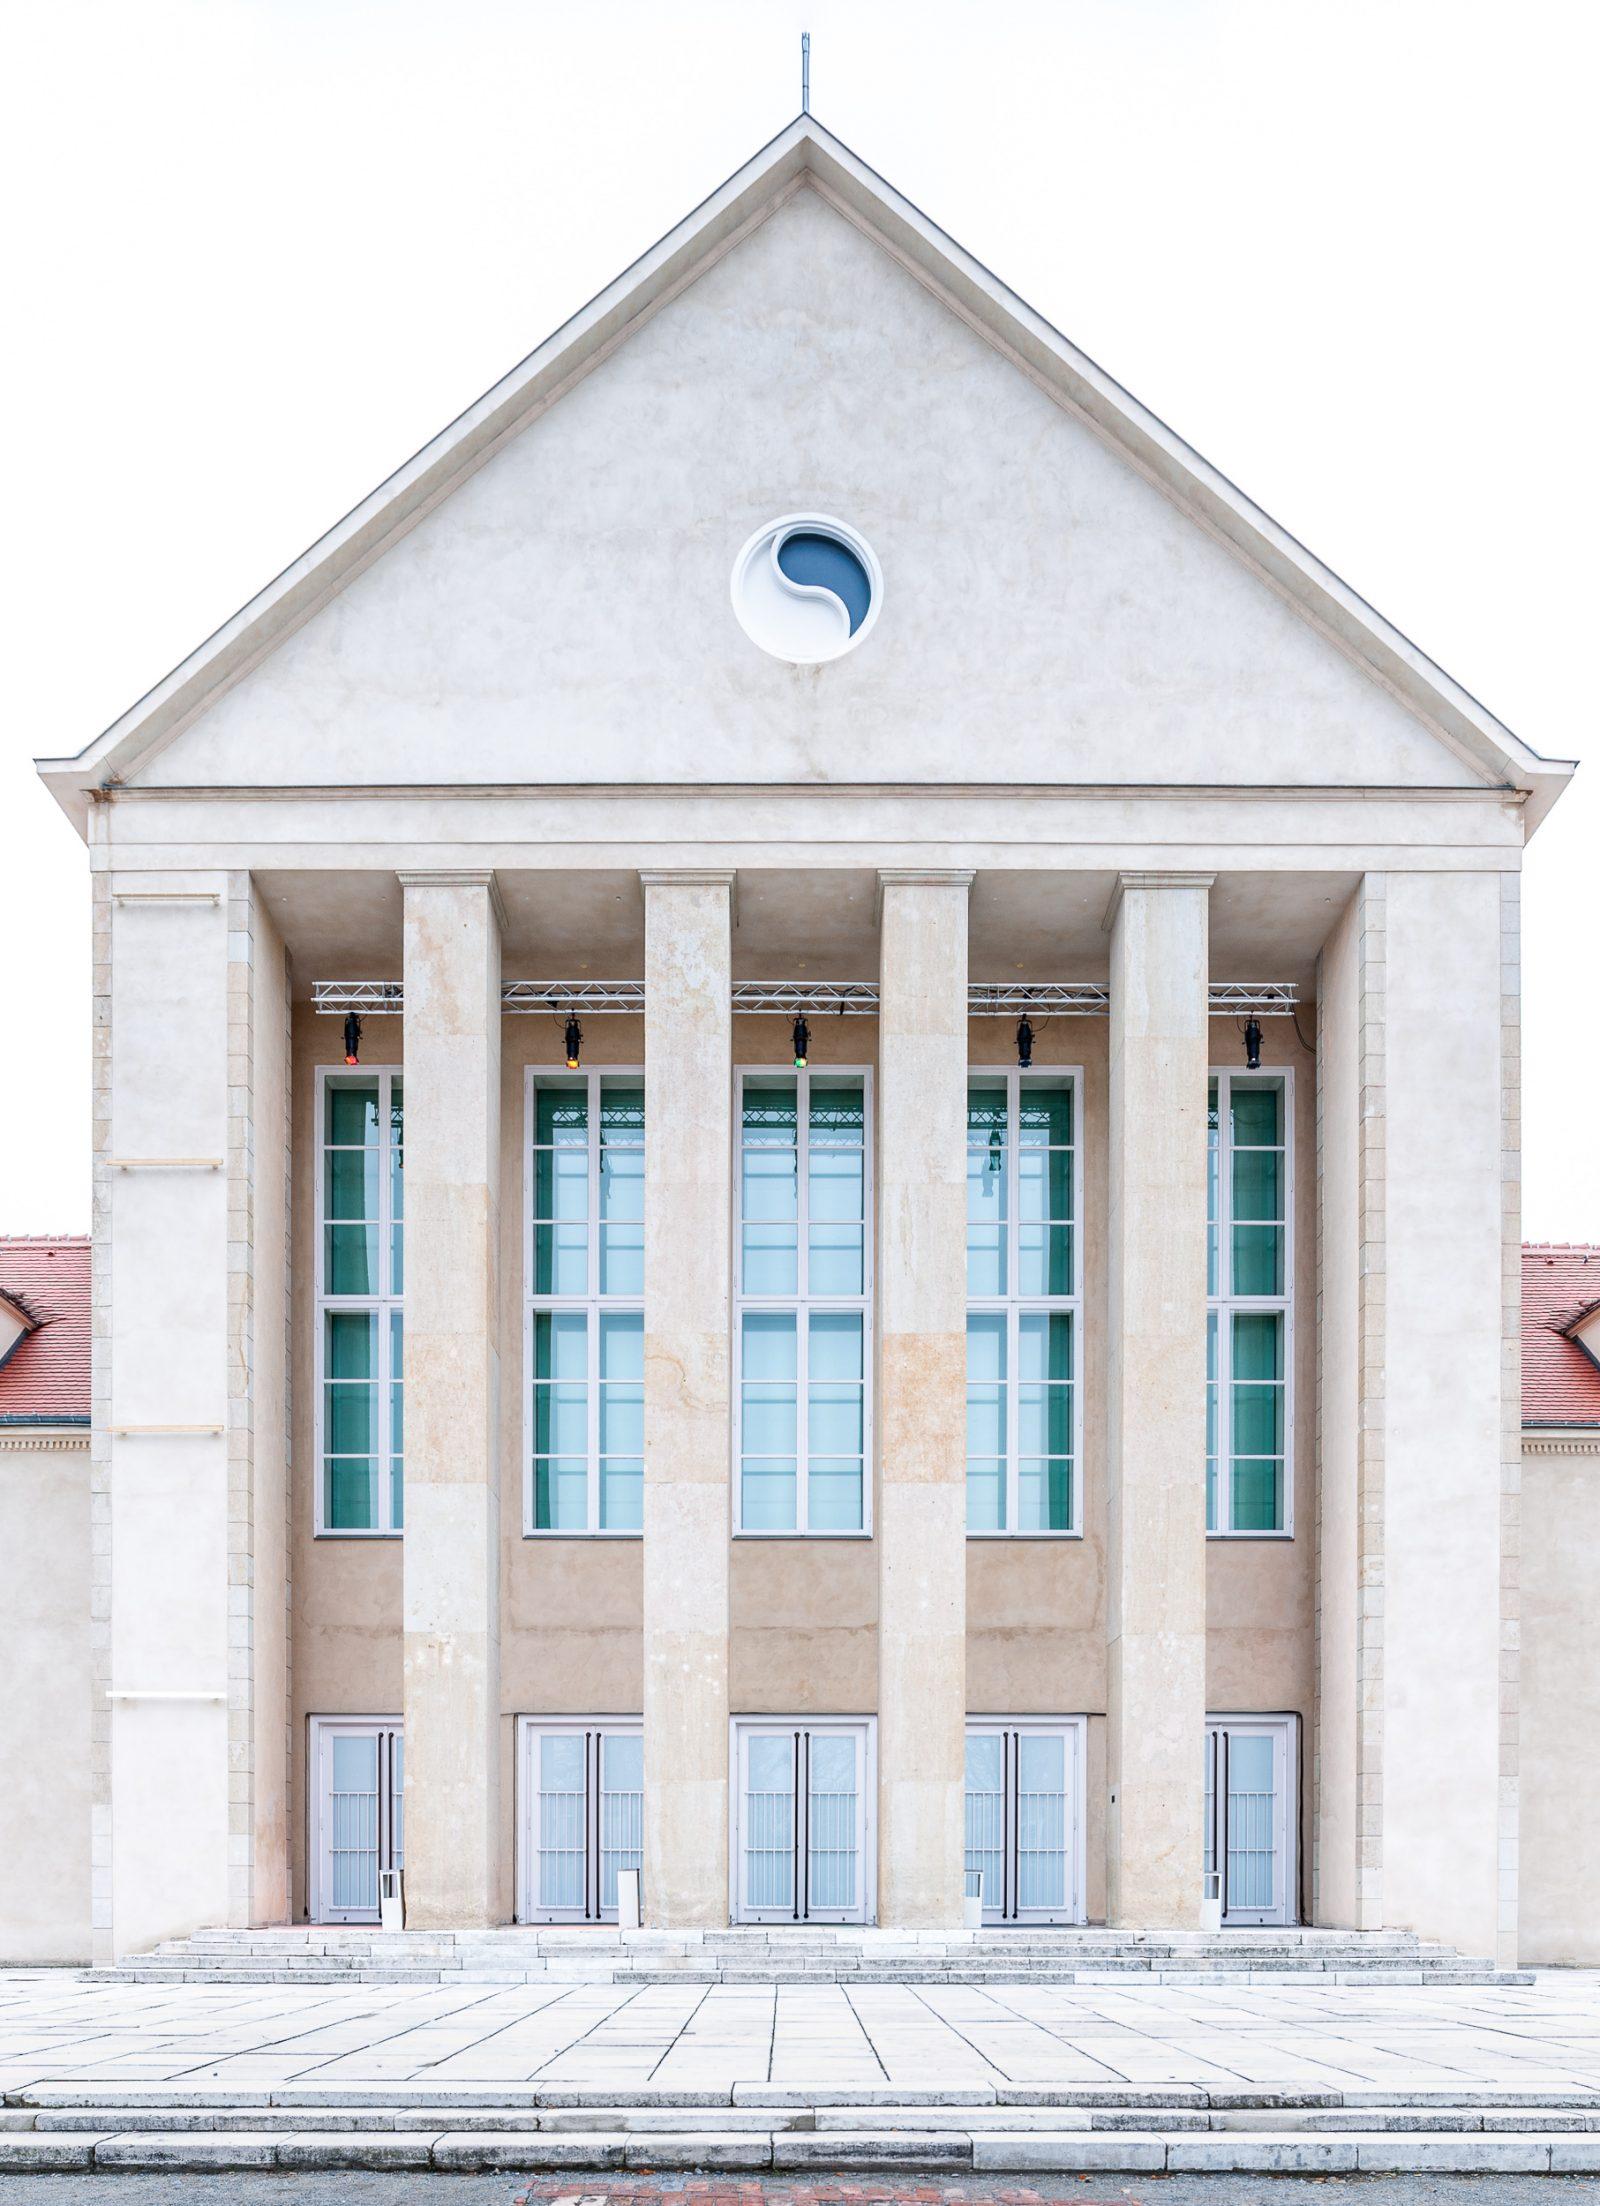 Portikus Festspielhaus-Hellerau, Dresden